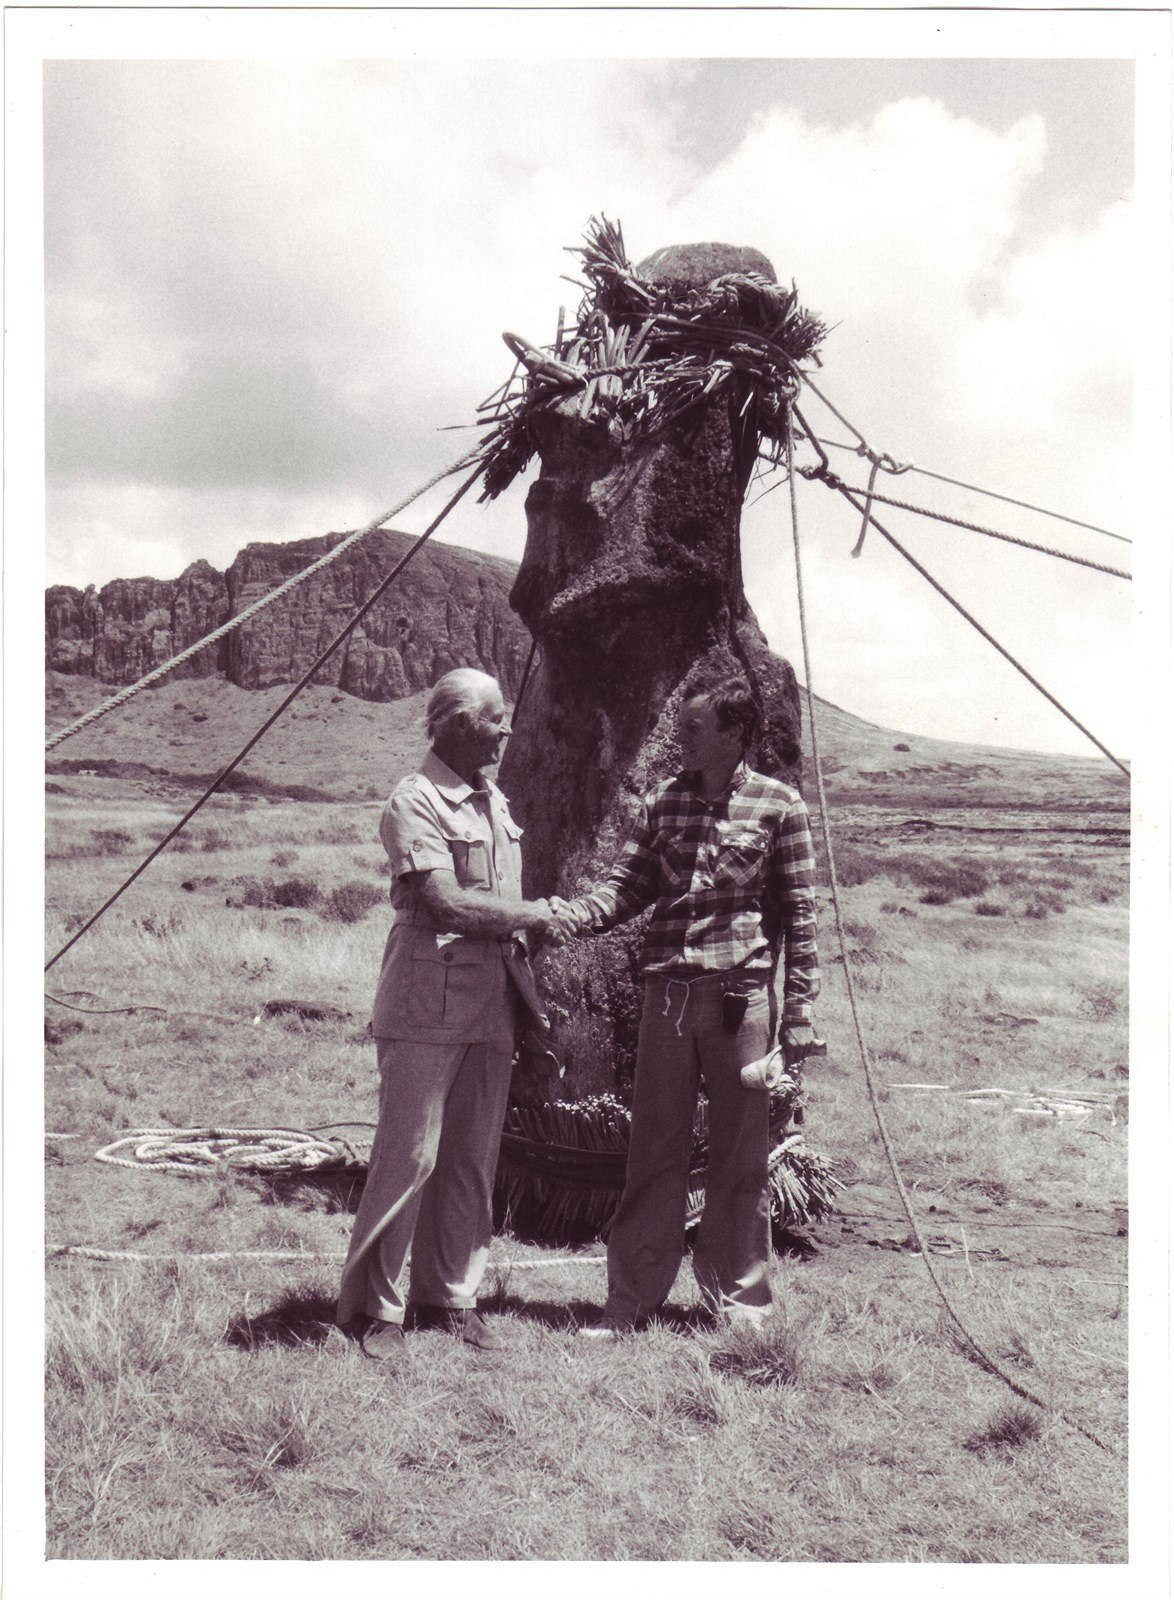 Pavel Thor Heyerdahl